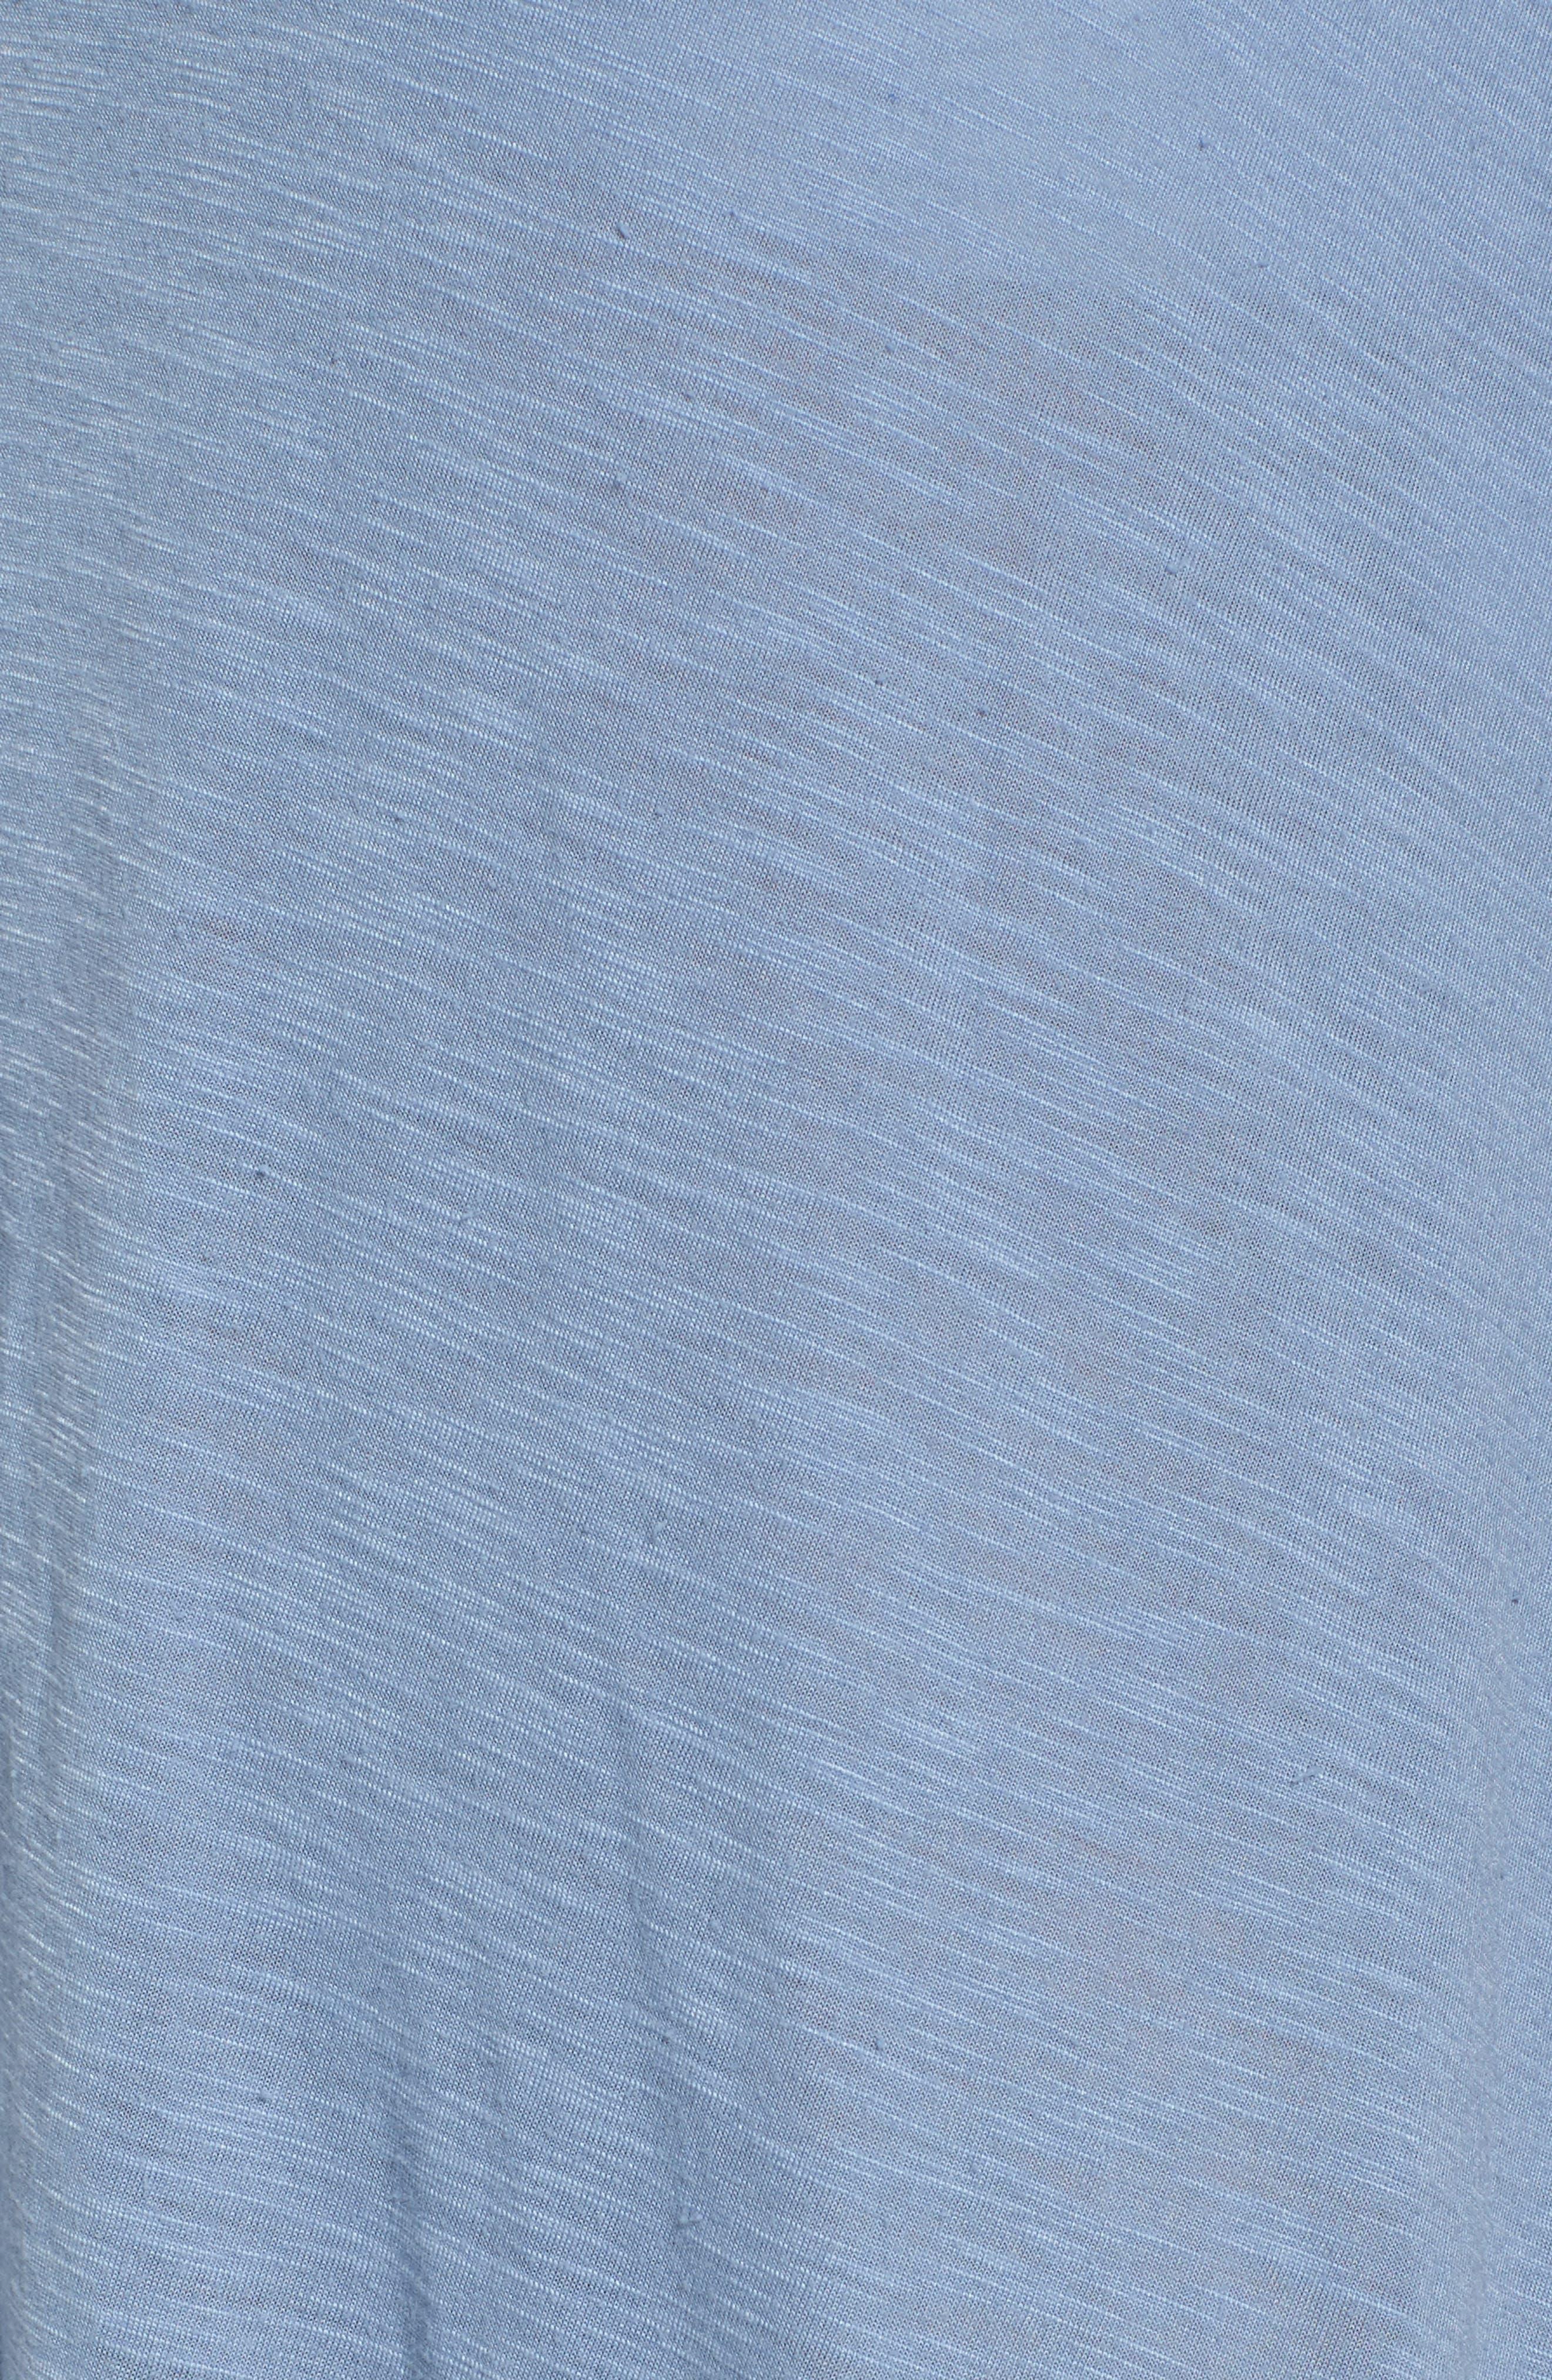 Breezy Basics Cover-Up Dress,                             Alternate thumbnail 5, color,                             Steel